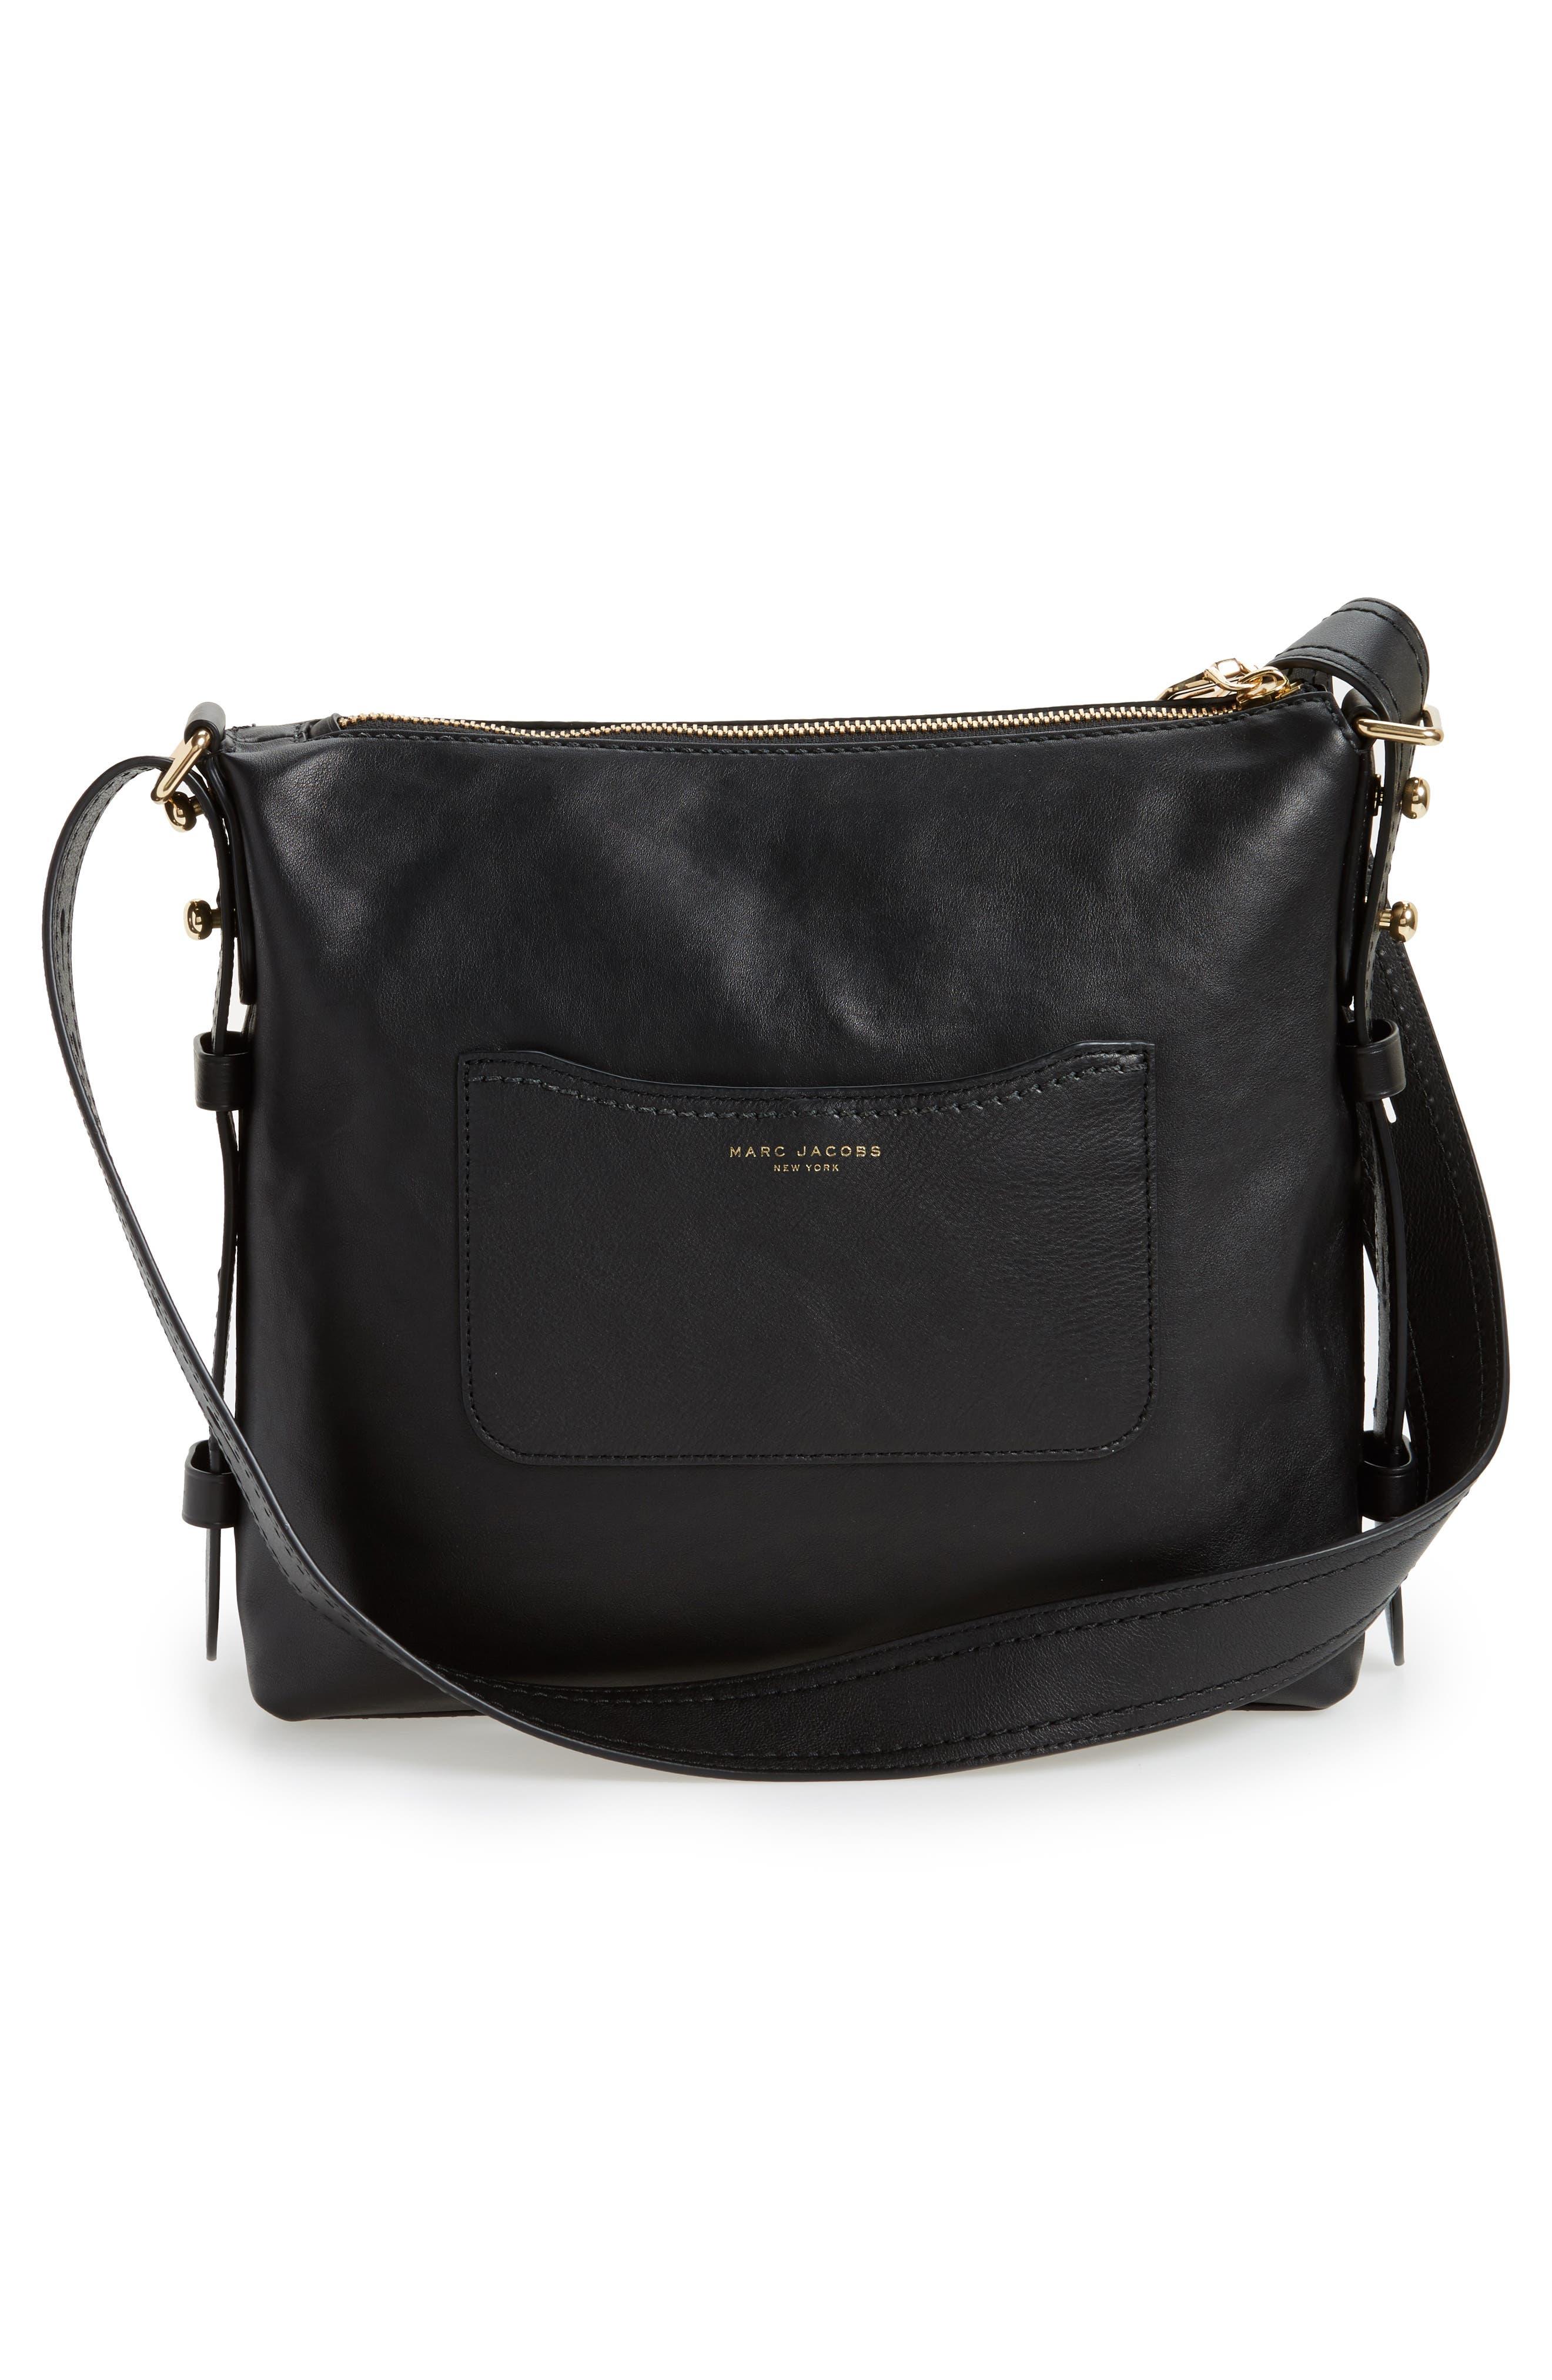 Downtown Stud Leather Shoulder Bag,                             Alternate thumbnail 2, color,                             Black